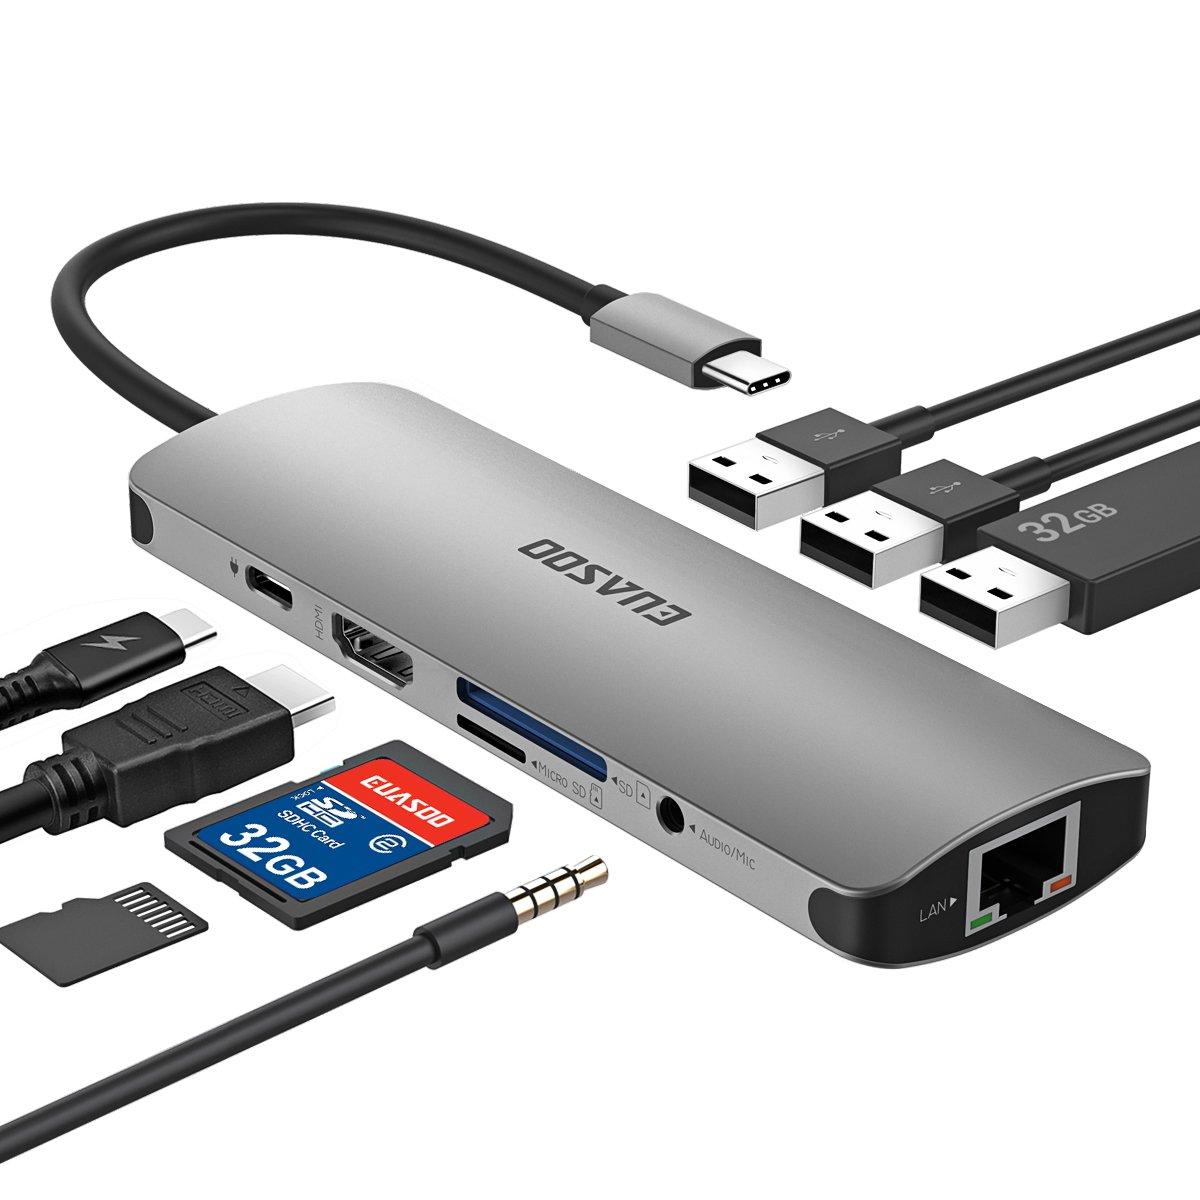 USB C Hub, USB C Adapter, EUASOO 9 in 1 Thunderbolt 3 hub, Multiport USB C to HDMI Adapter Type C Charging Port, USB 3.0 Ports, Ethernet Port MacBook Pro 2017/2016, Chromebook Pixel More